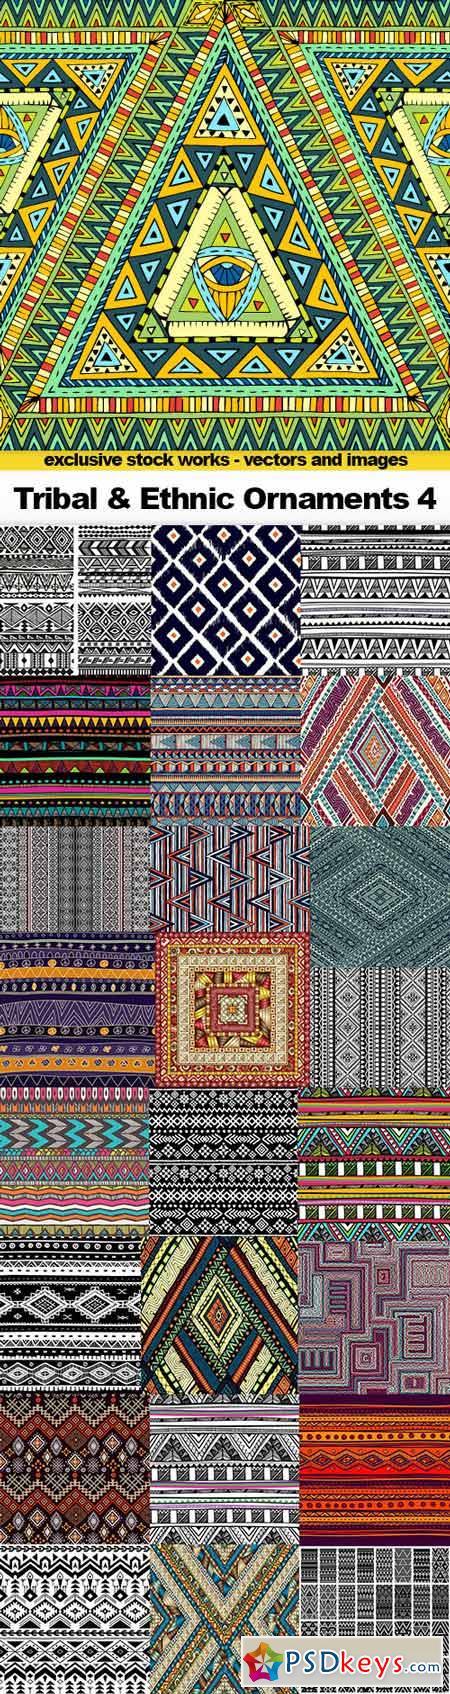 Tribal & Ethnic Ornaments 4 - 25x EPS